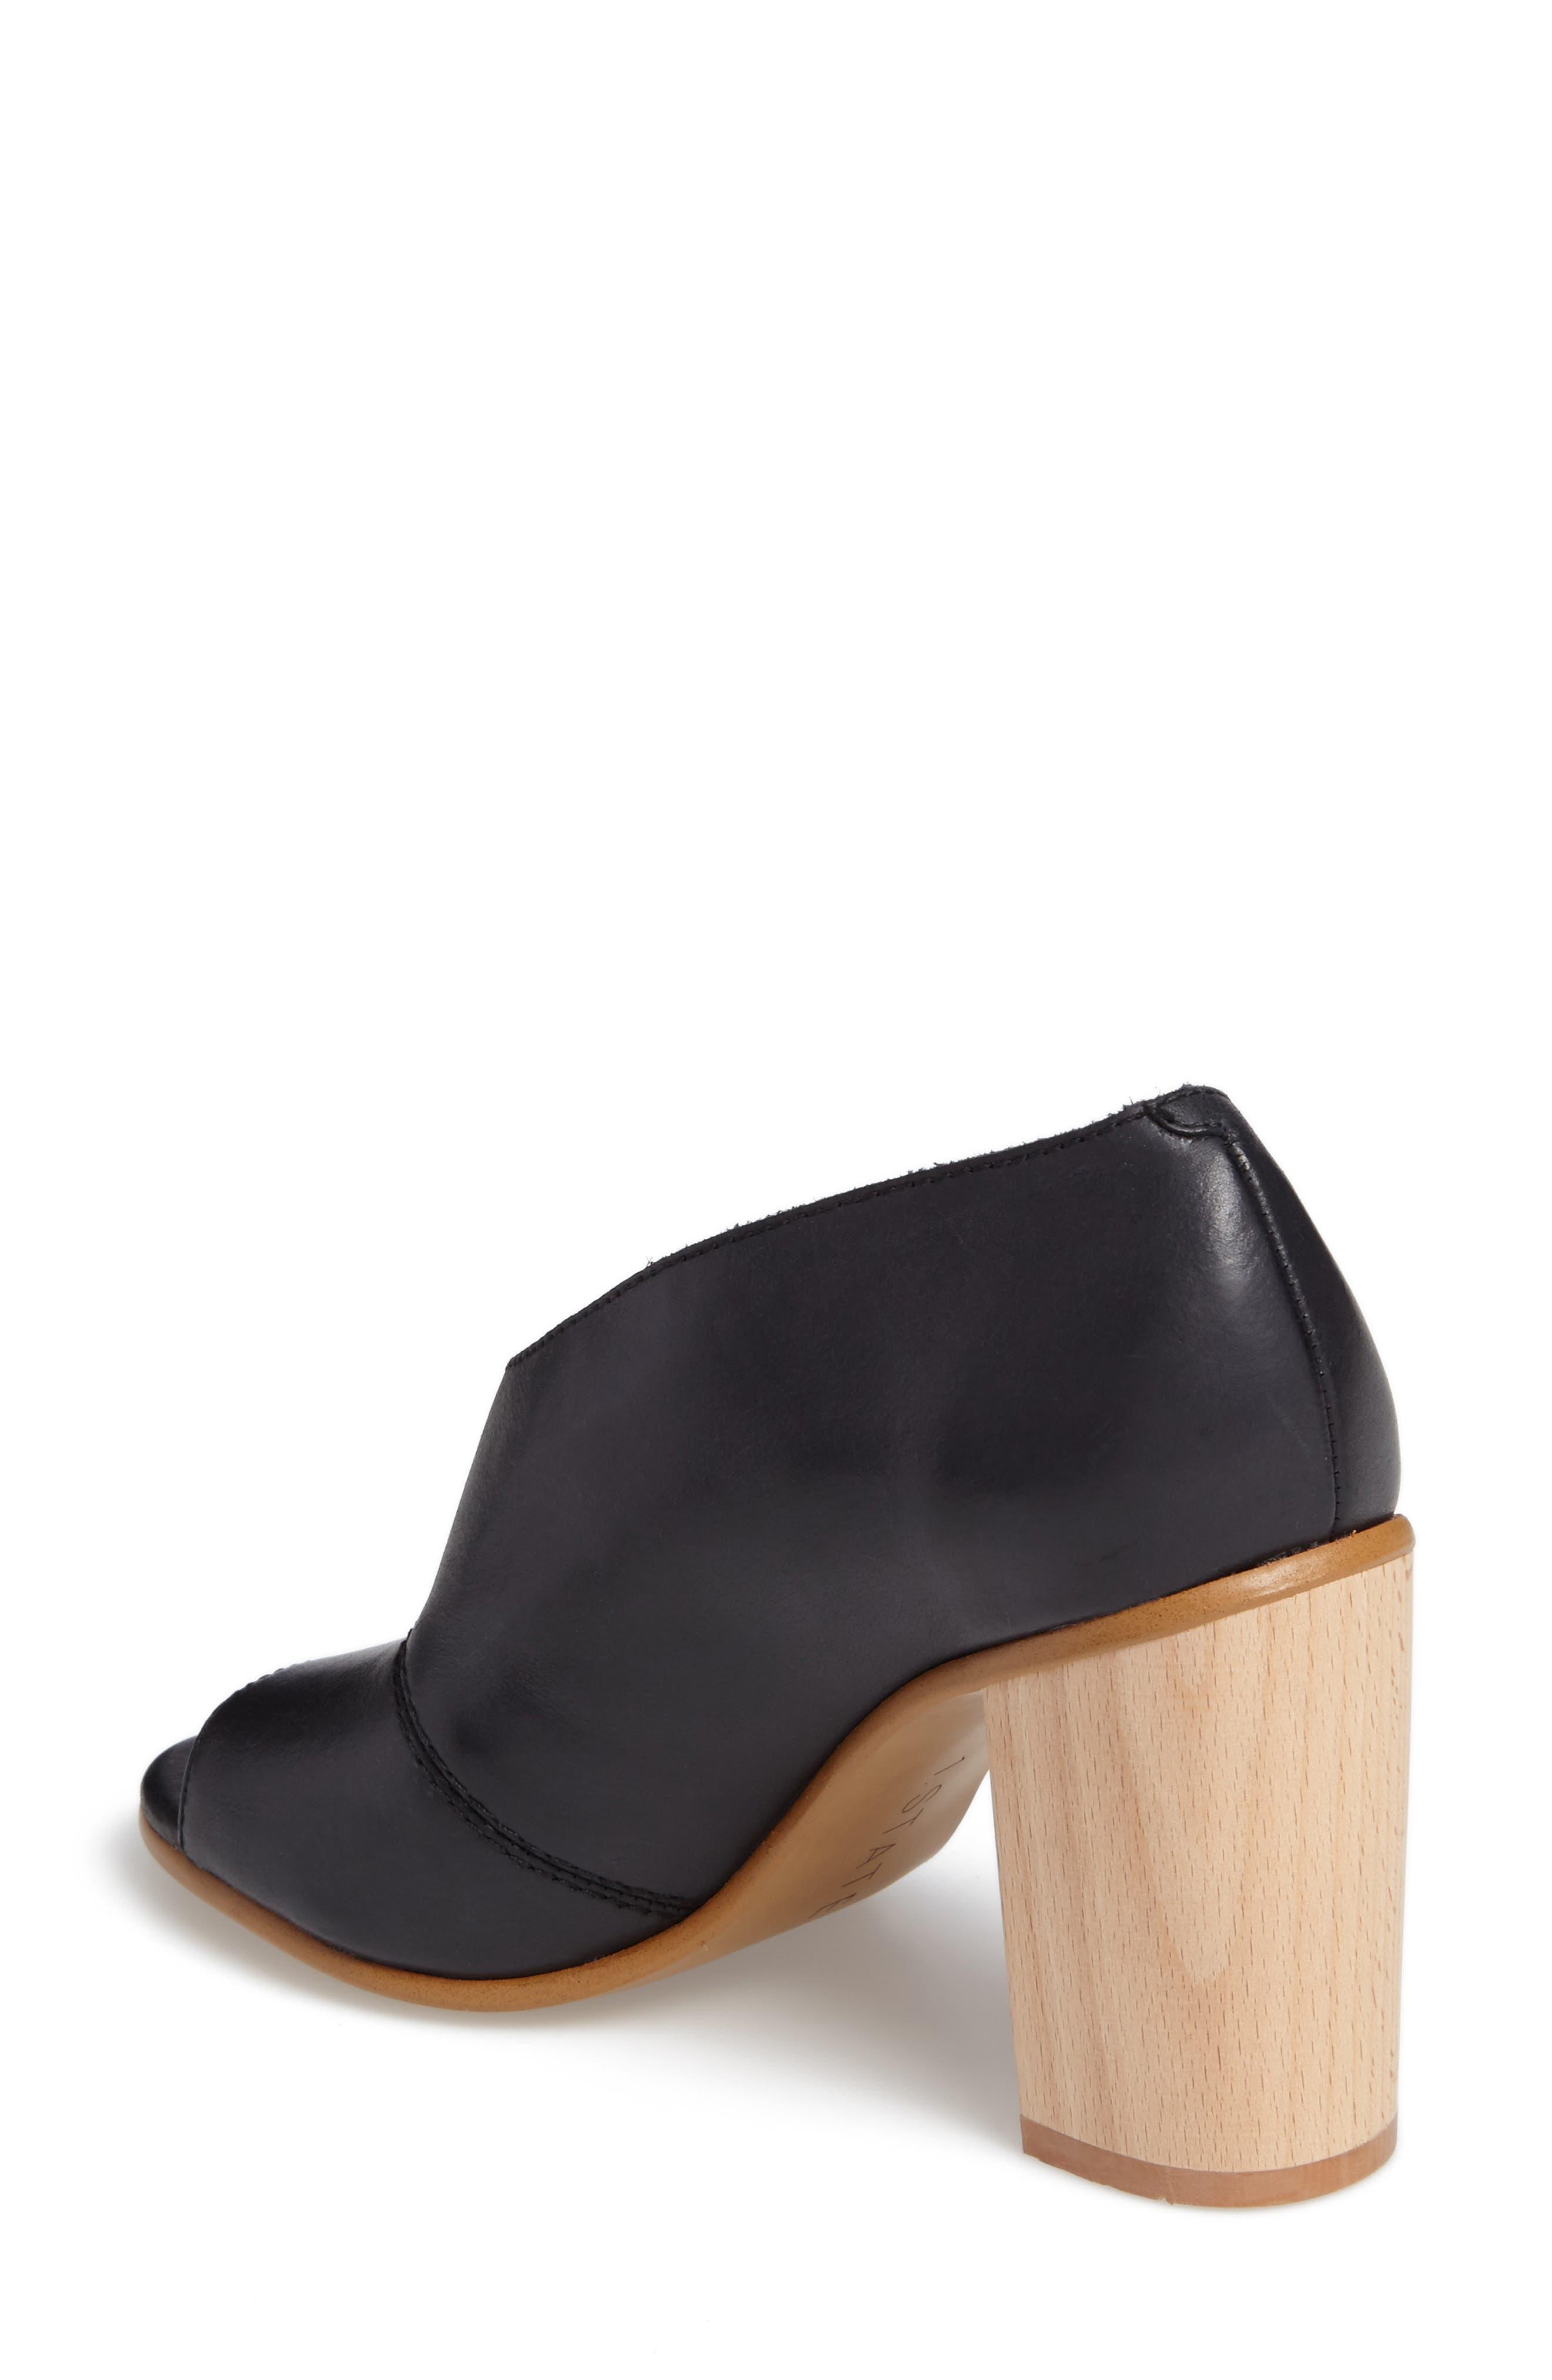 Amble Asymmetrical Sandal,                             Alternate thumbnail 2, color,                             001